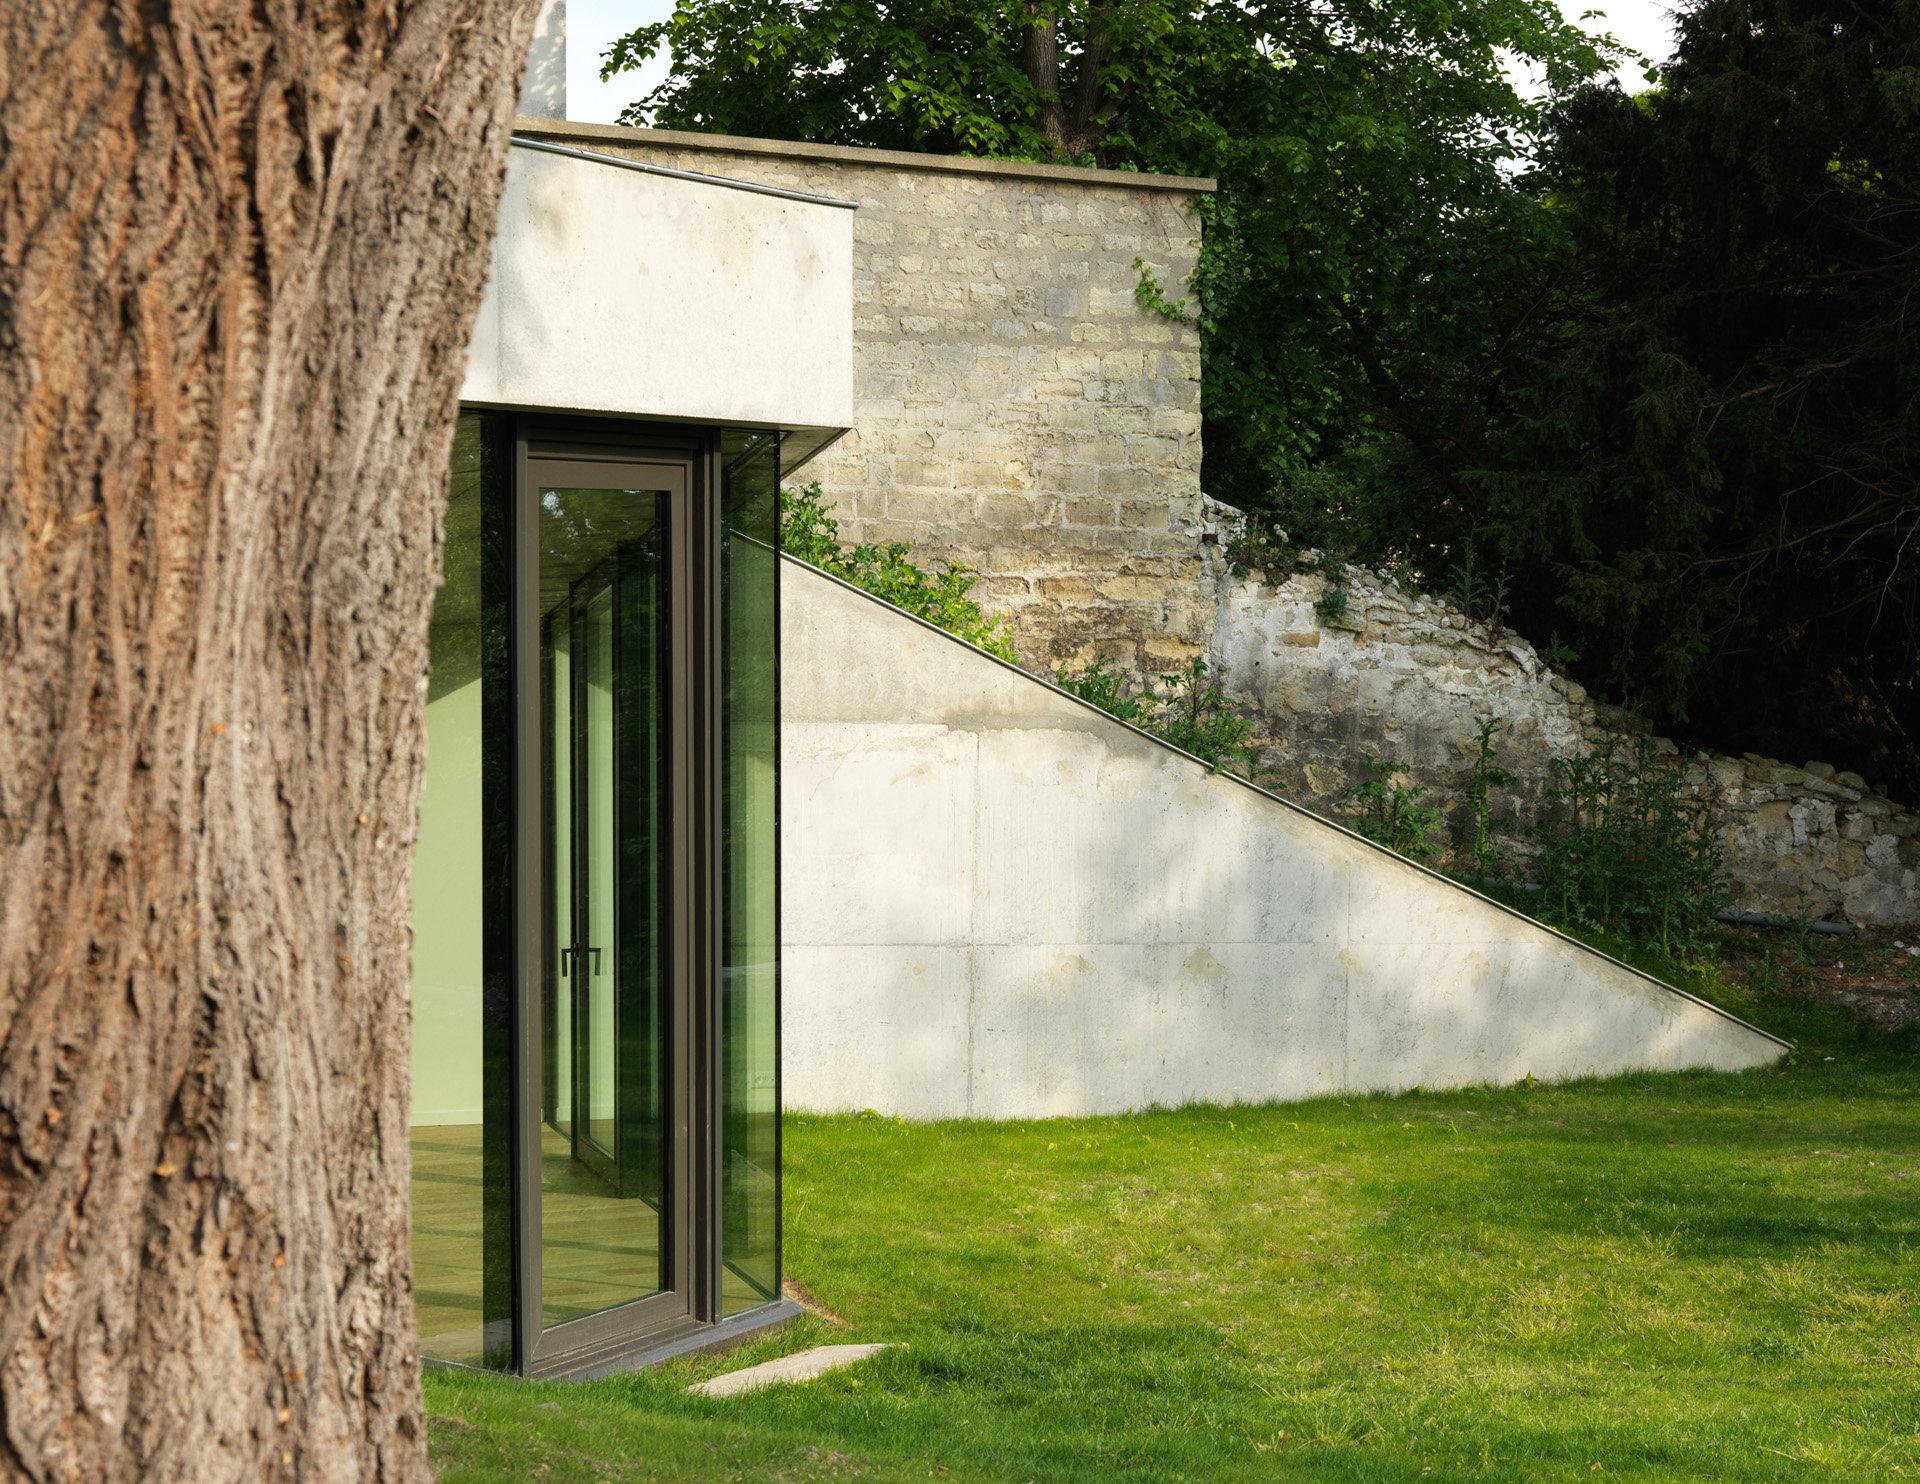 Reportage architecture - St-Germain-en-Laye